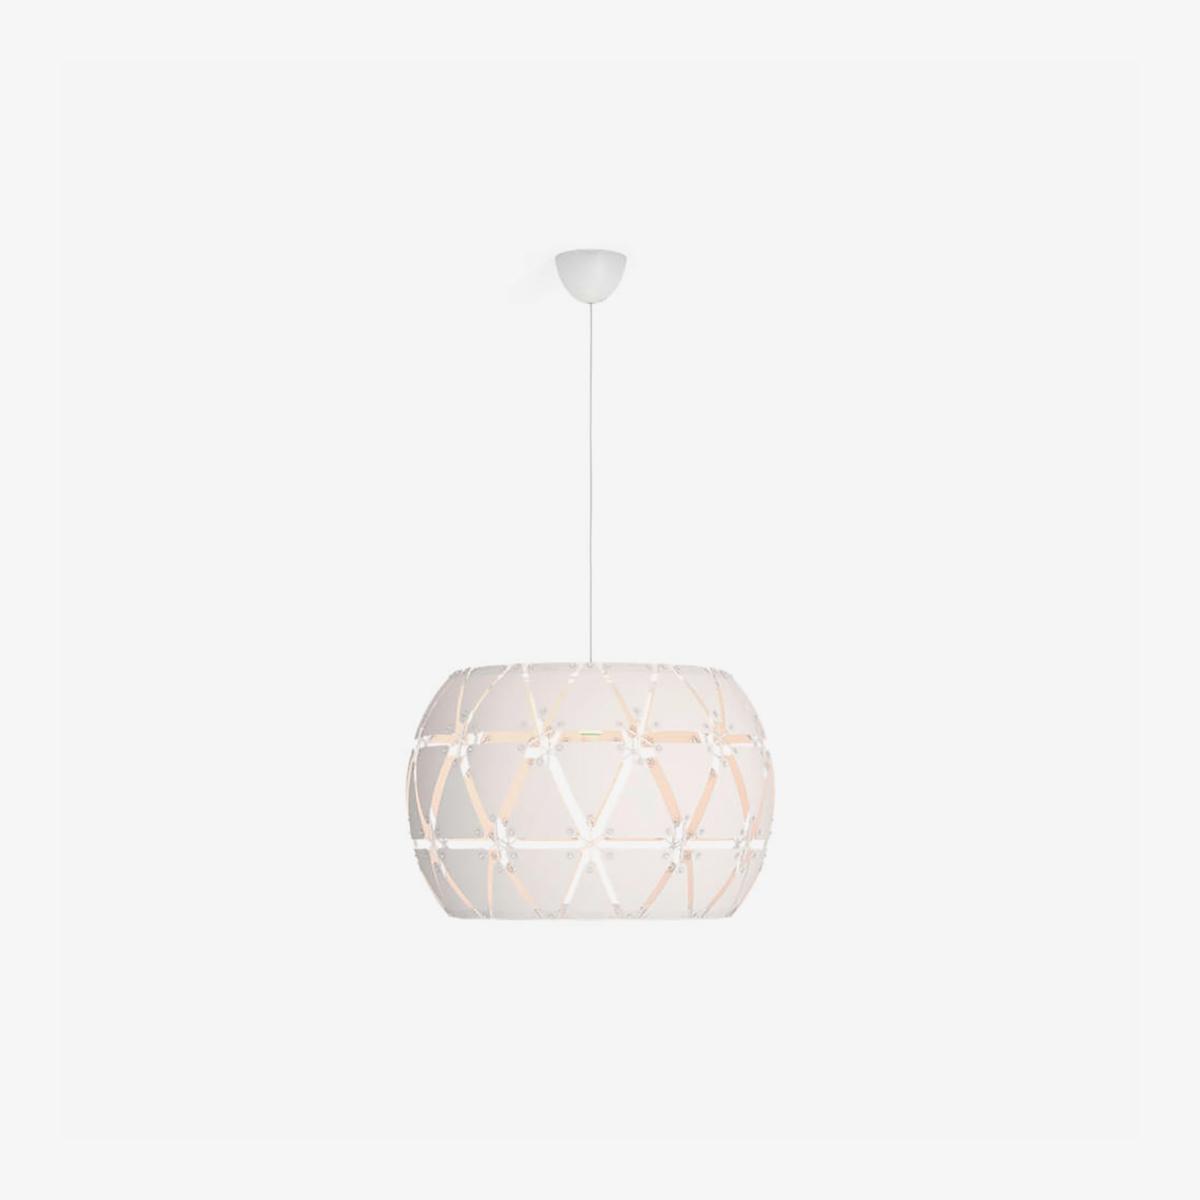 Lámpara colgante Sandalwood blanco Philips-0